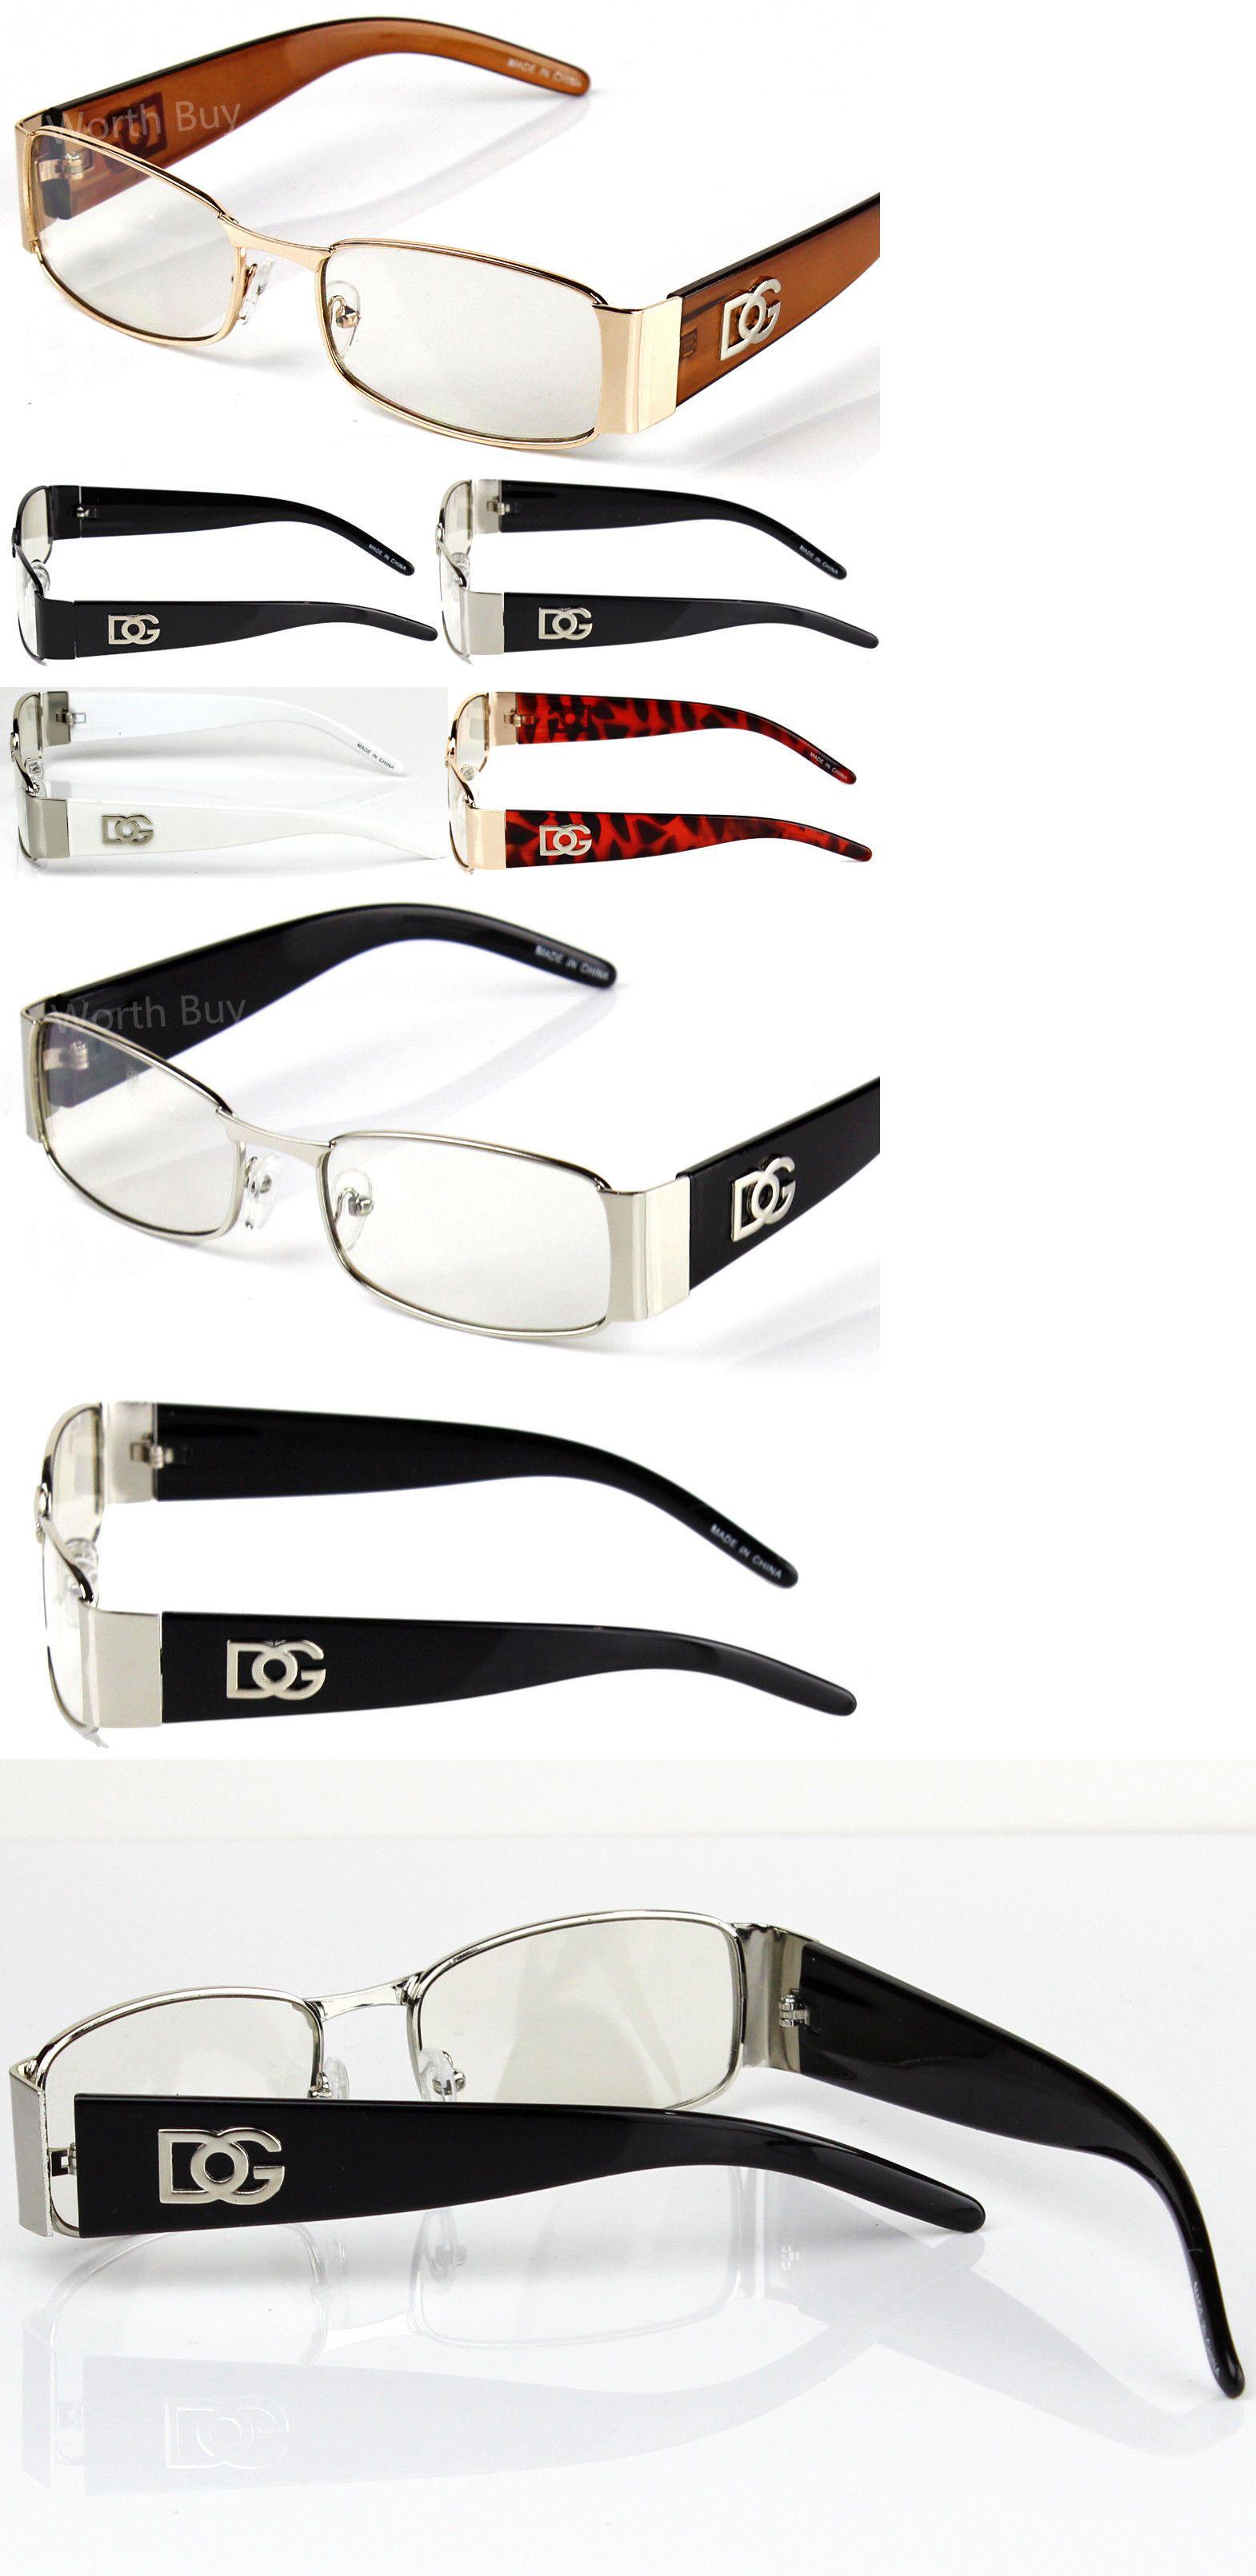 866a5e4c707b Sunglasses and Sunglasses Accessories 179243  Men Women Dg Clear Lens  Designer Rectangular Eyeglasses Retro Fashion